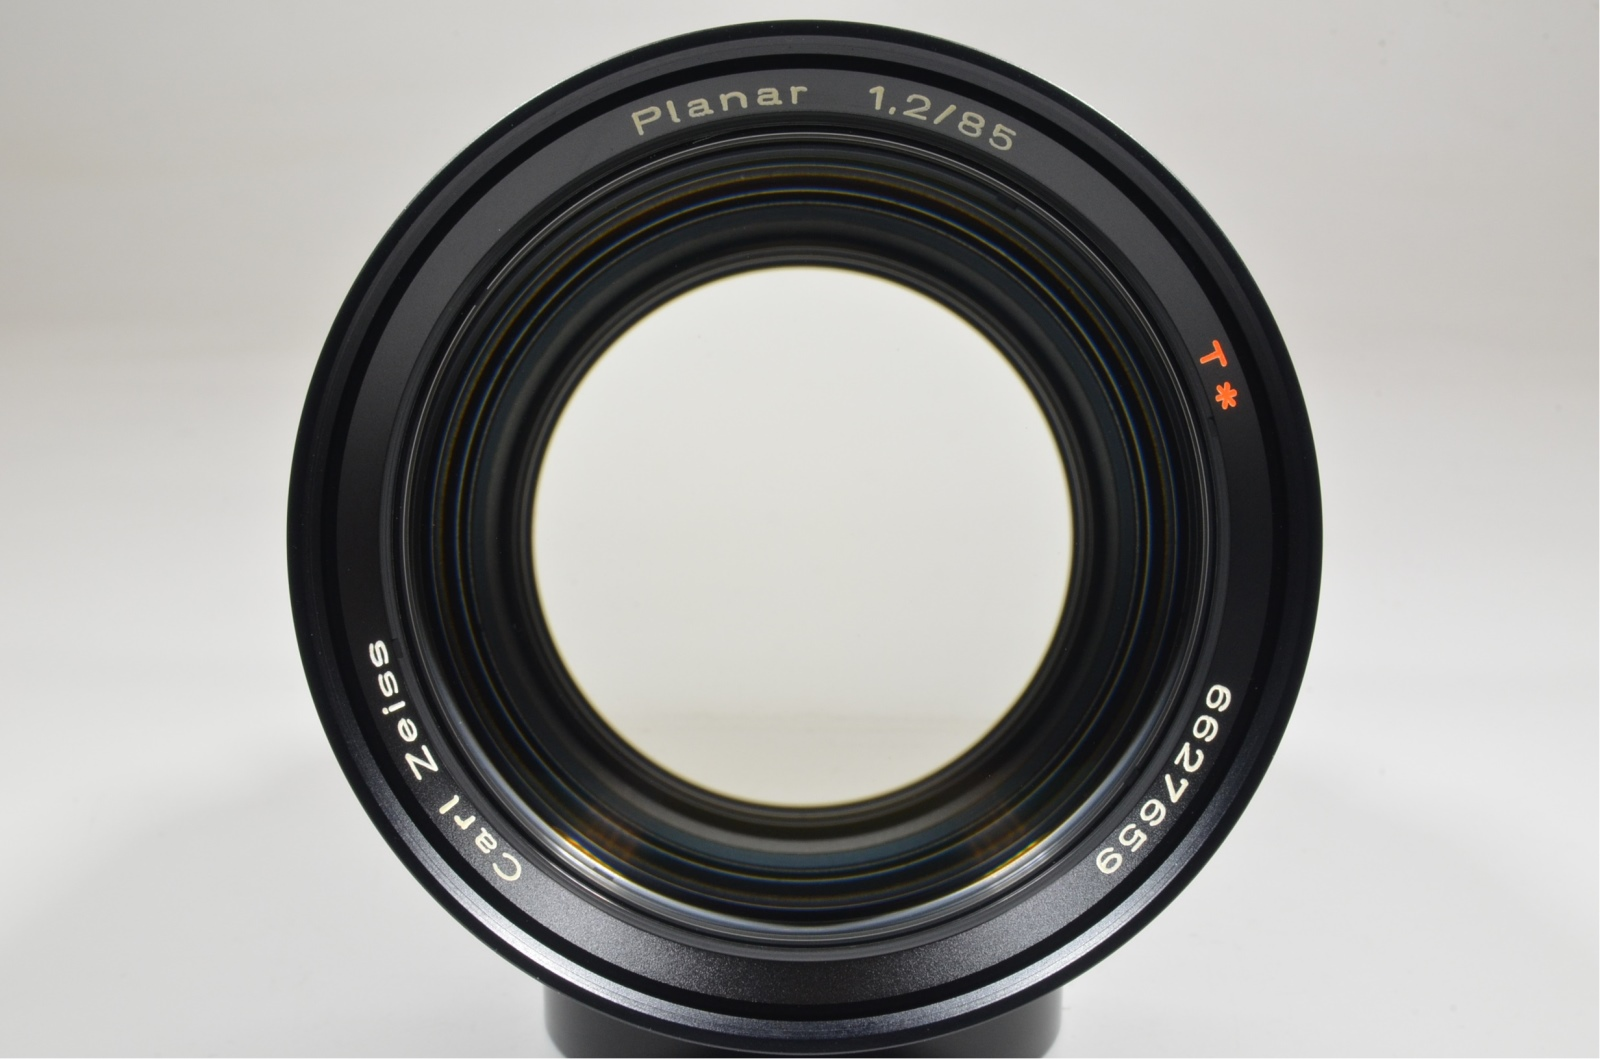 contax carl zeiss planar t* 85mm f1.2 aeg 50 years anniversary